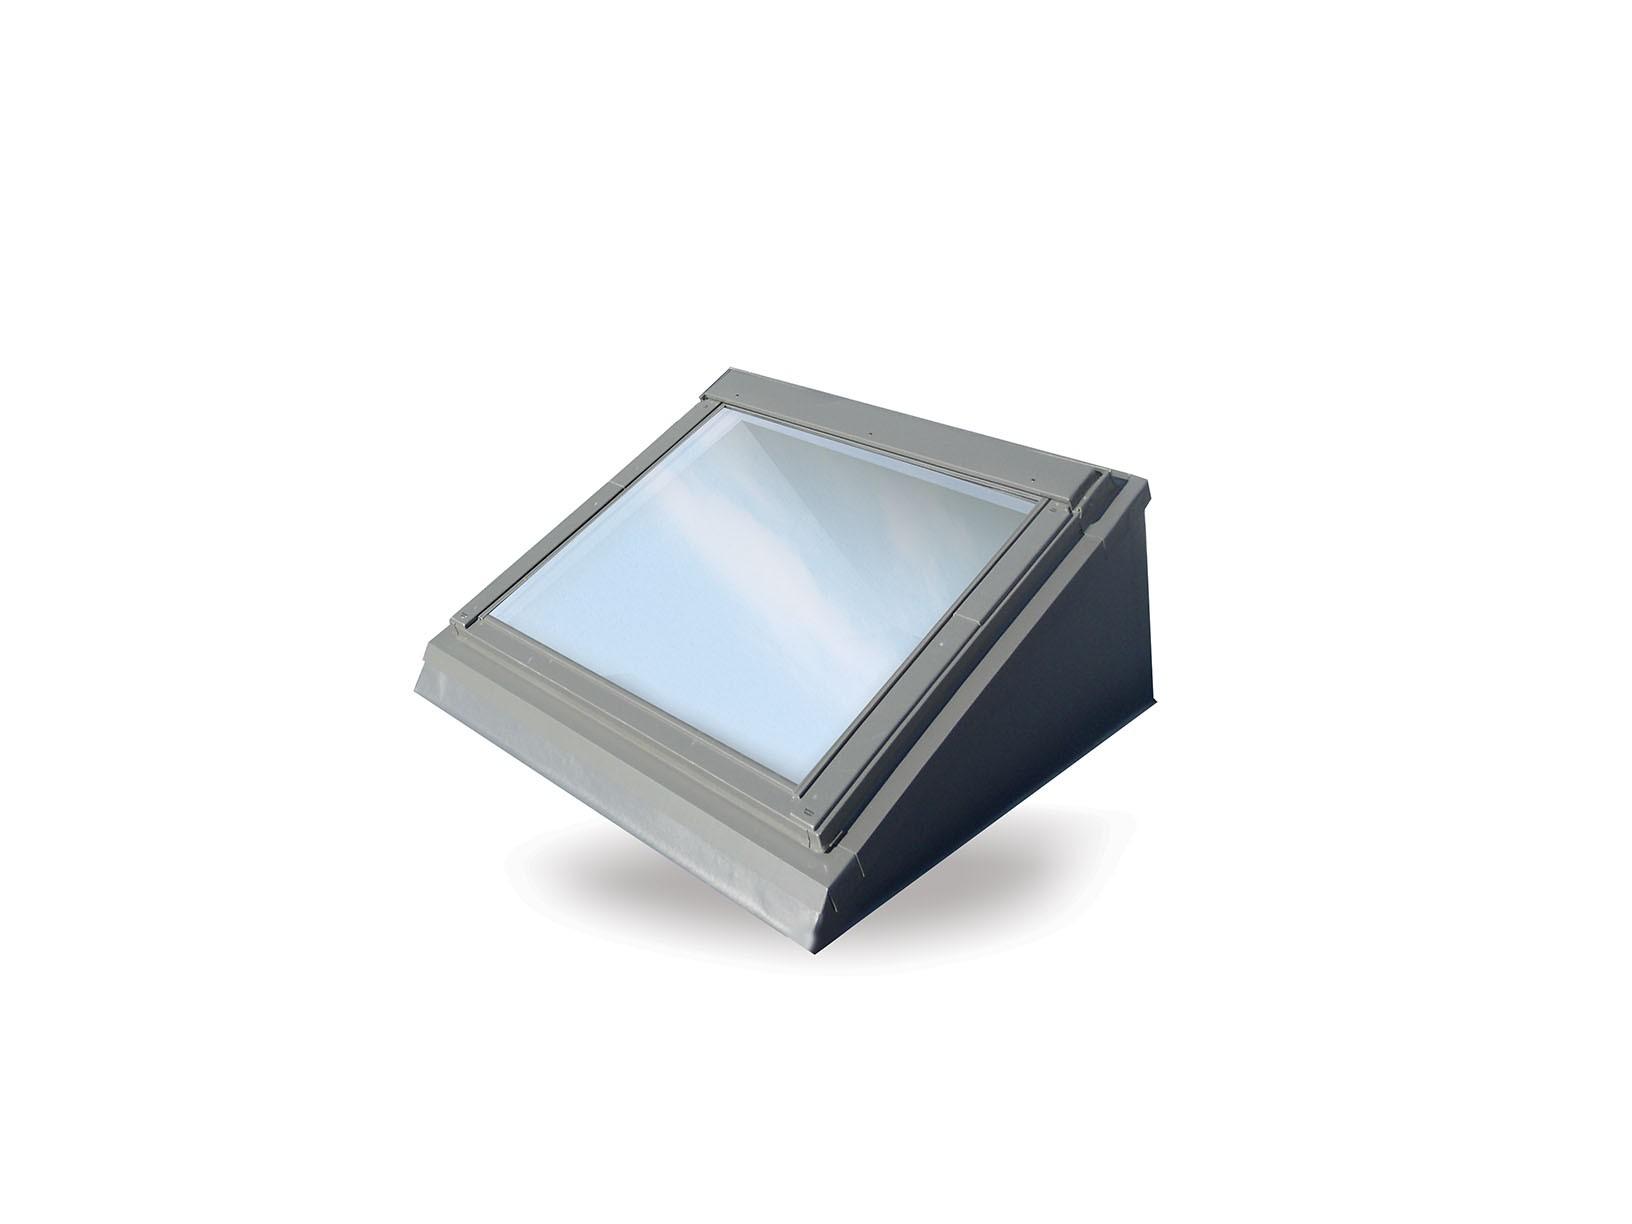 KEYLITE - Flat Roof System